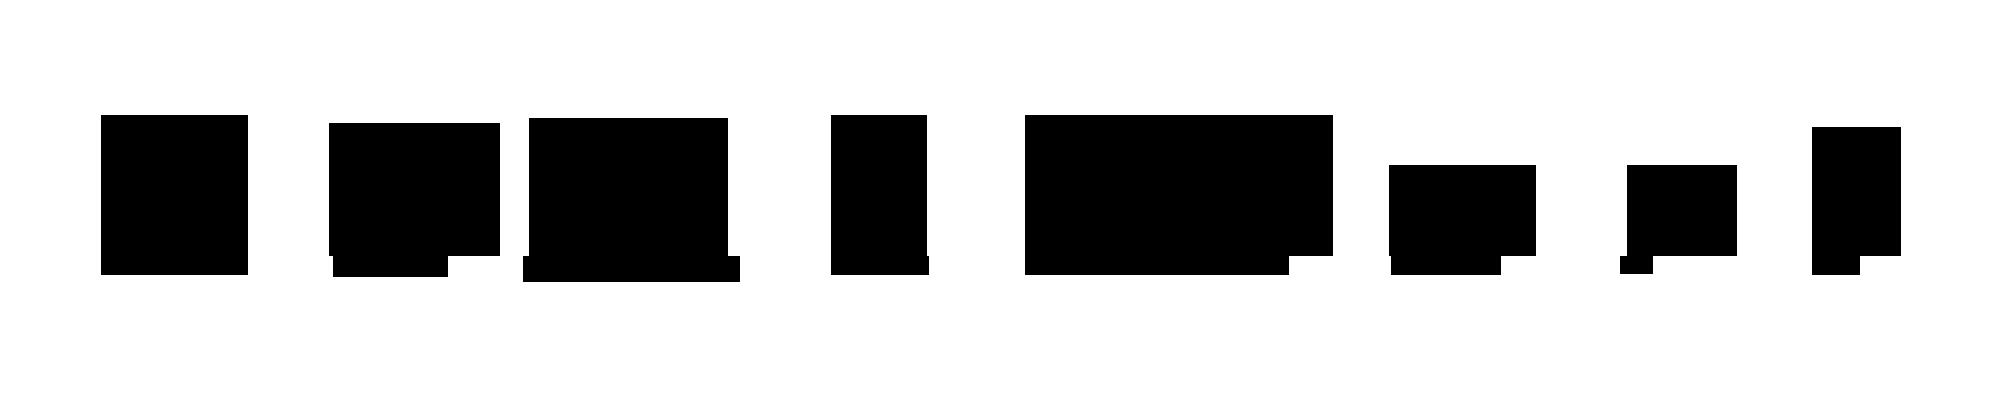 MOMENTart_logo2.png